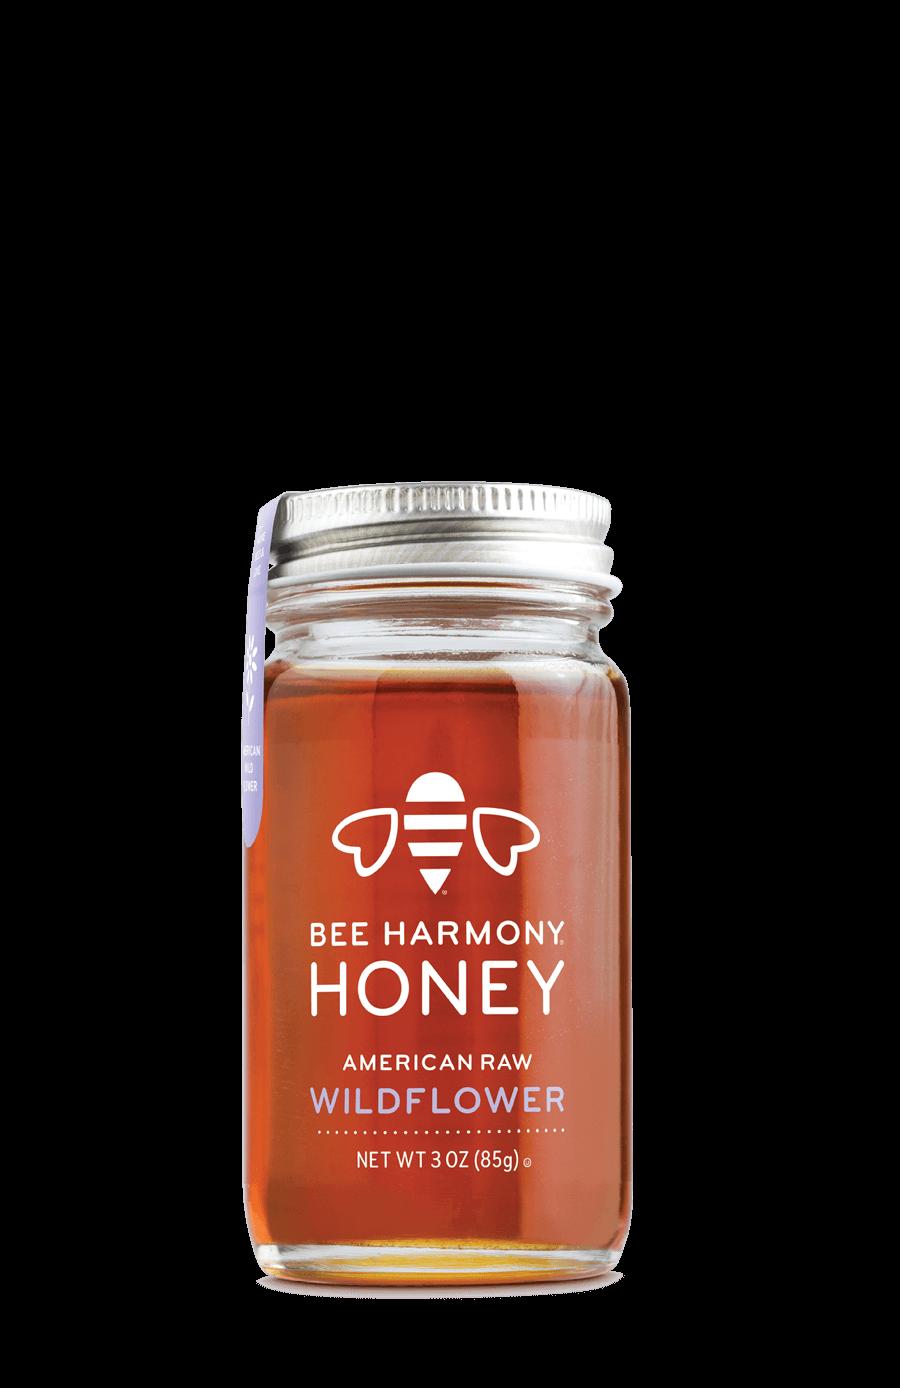 Bee Harmony - American Wildflower 3oz Honey Jar - Beesponsible